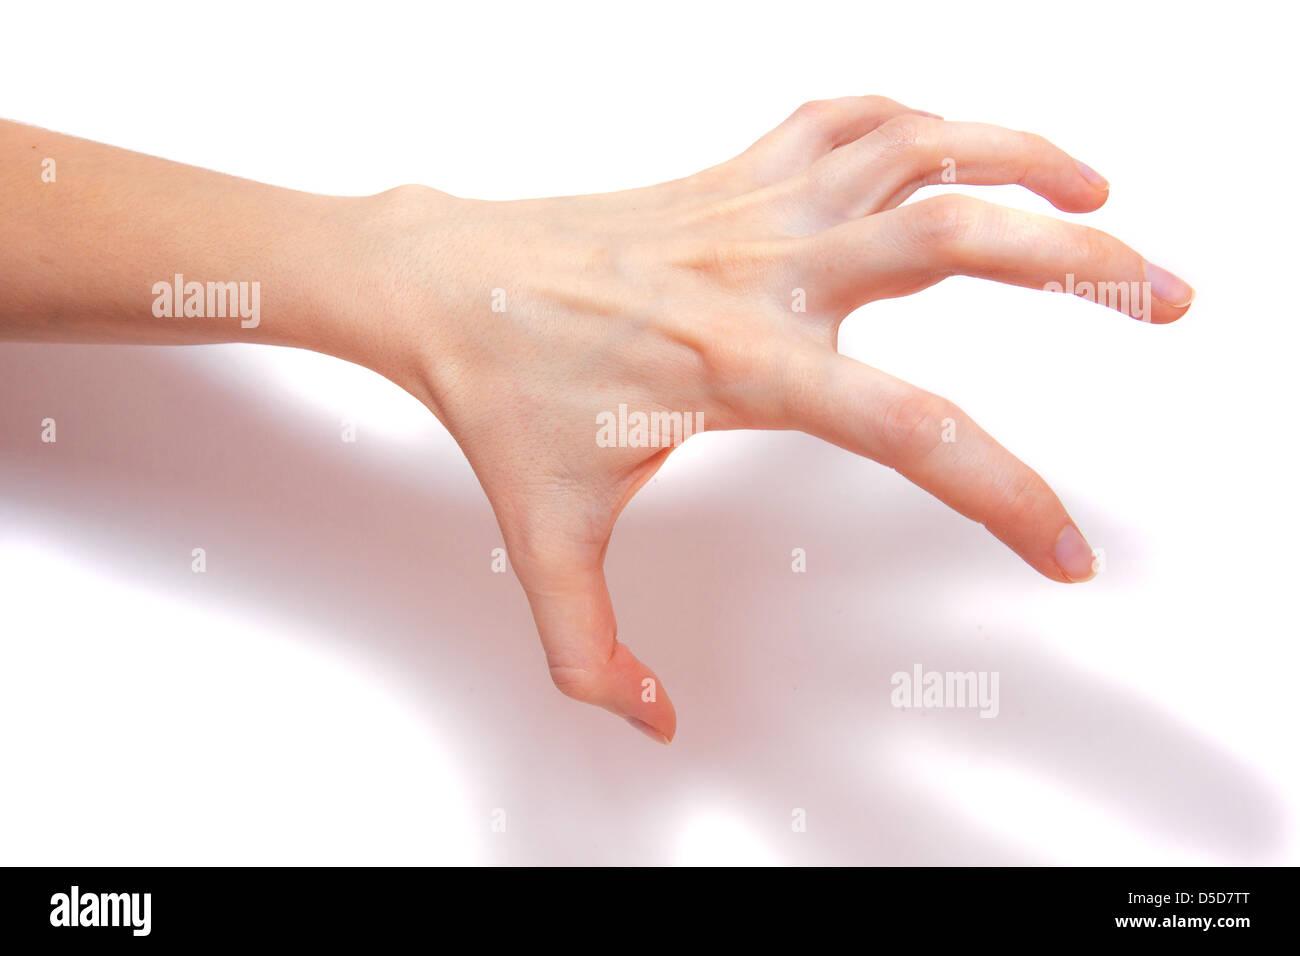 Scary, frightening hand isolated on white background - Stock Image